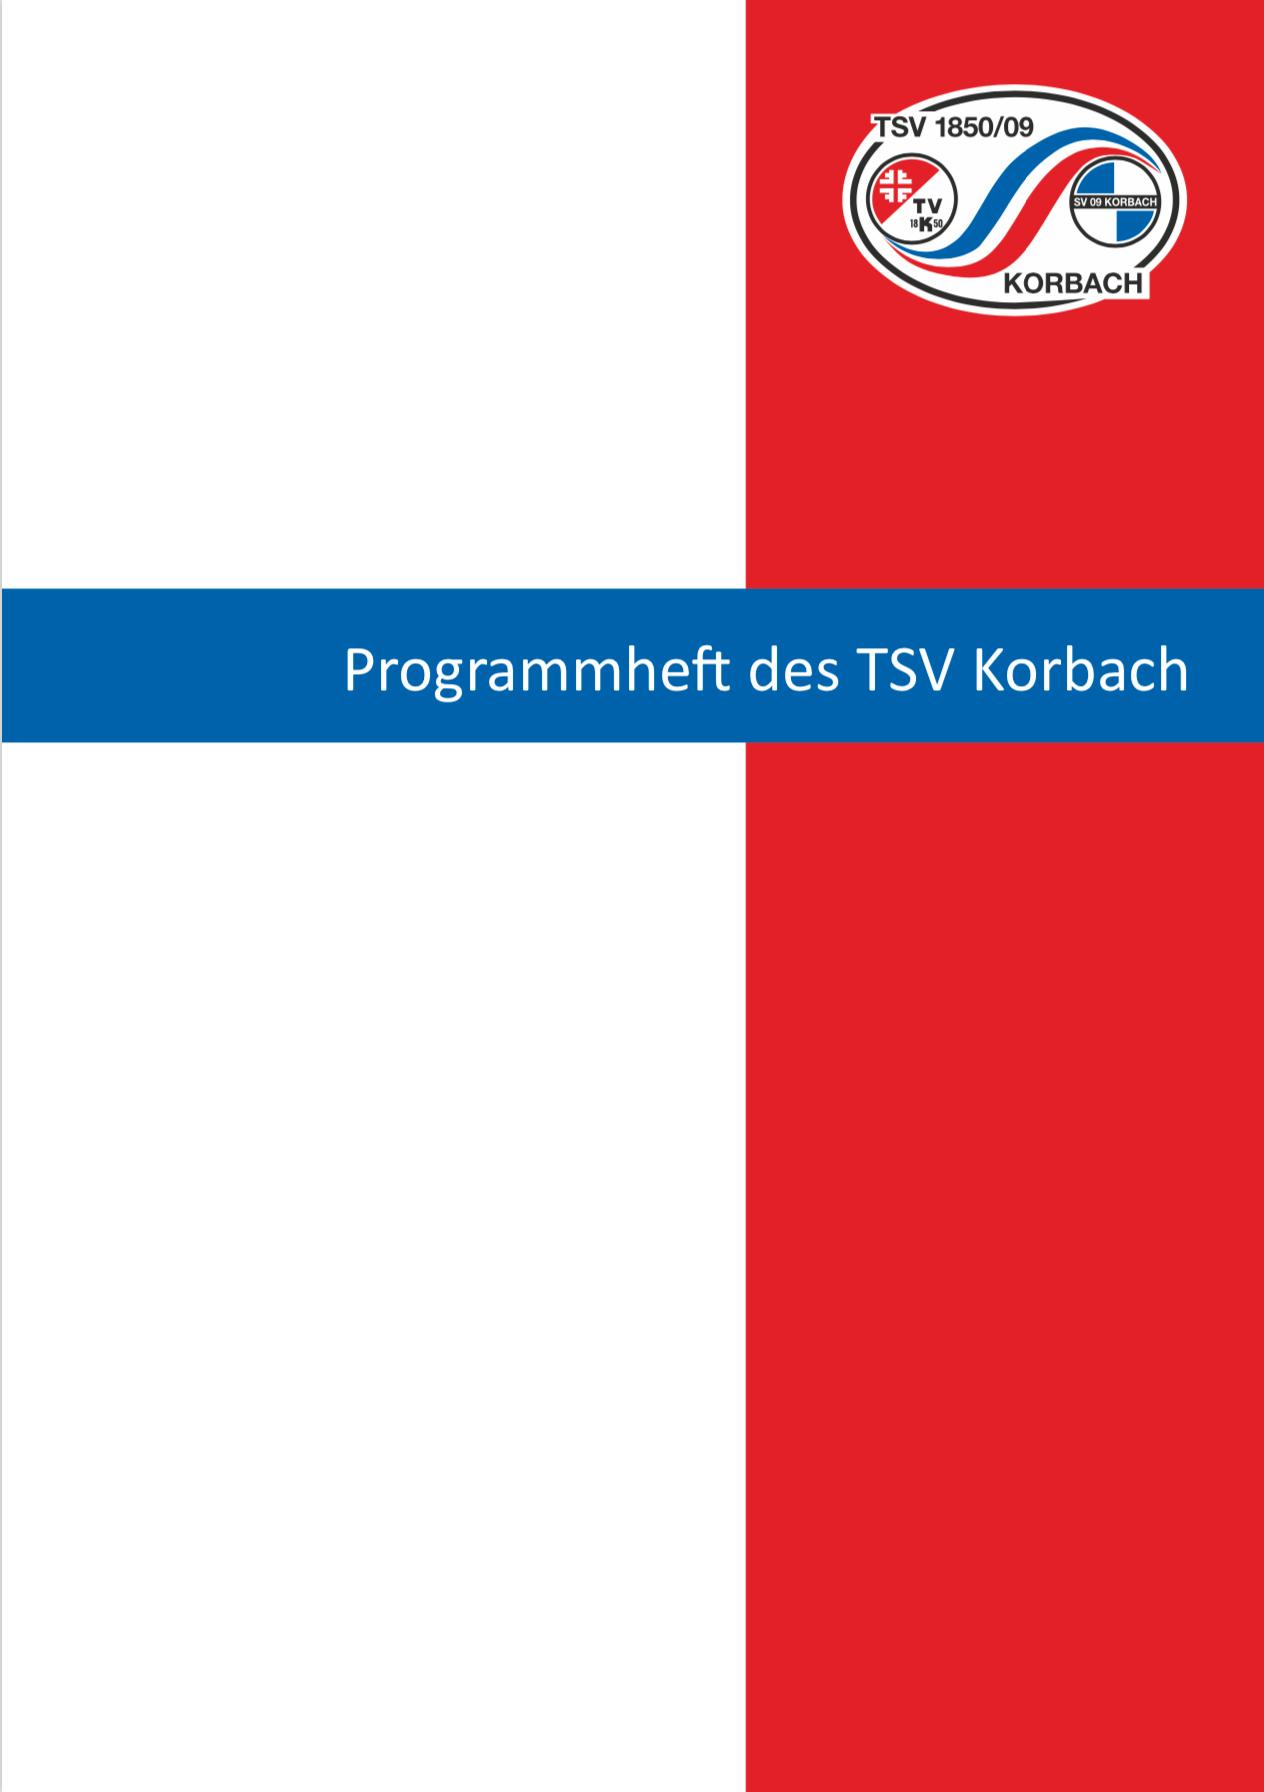 Programmheft des TSV 1850/009 Korbach e.V.